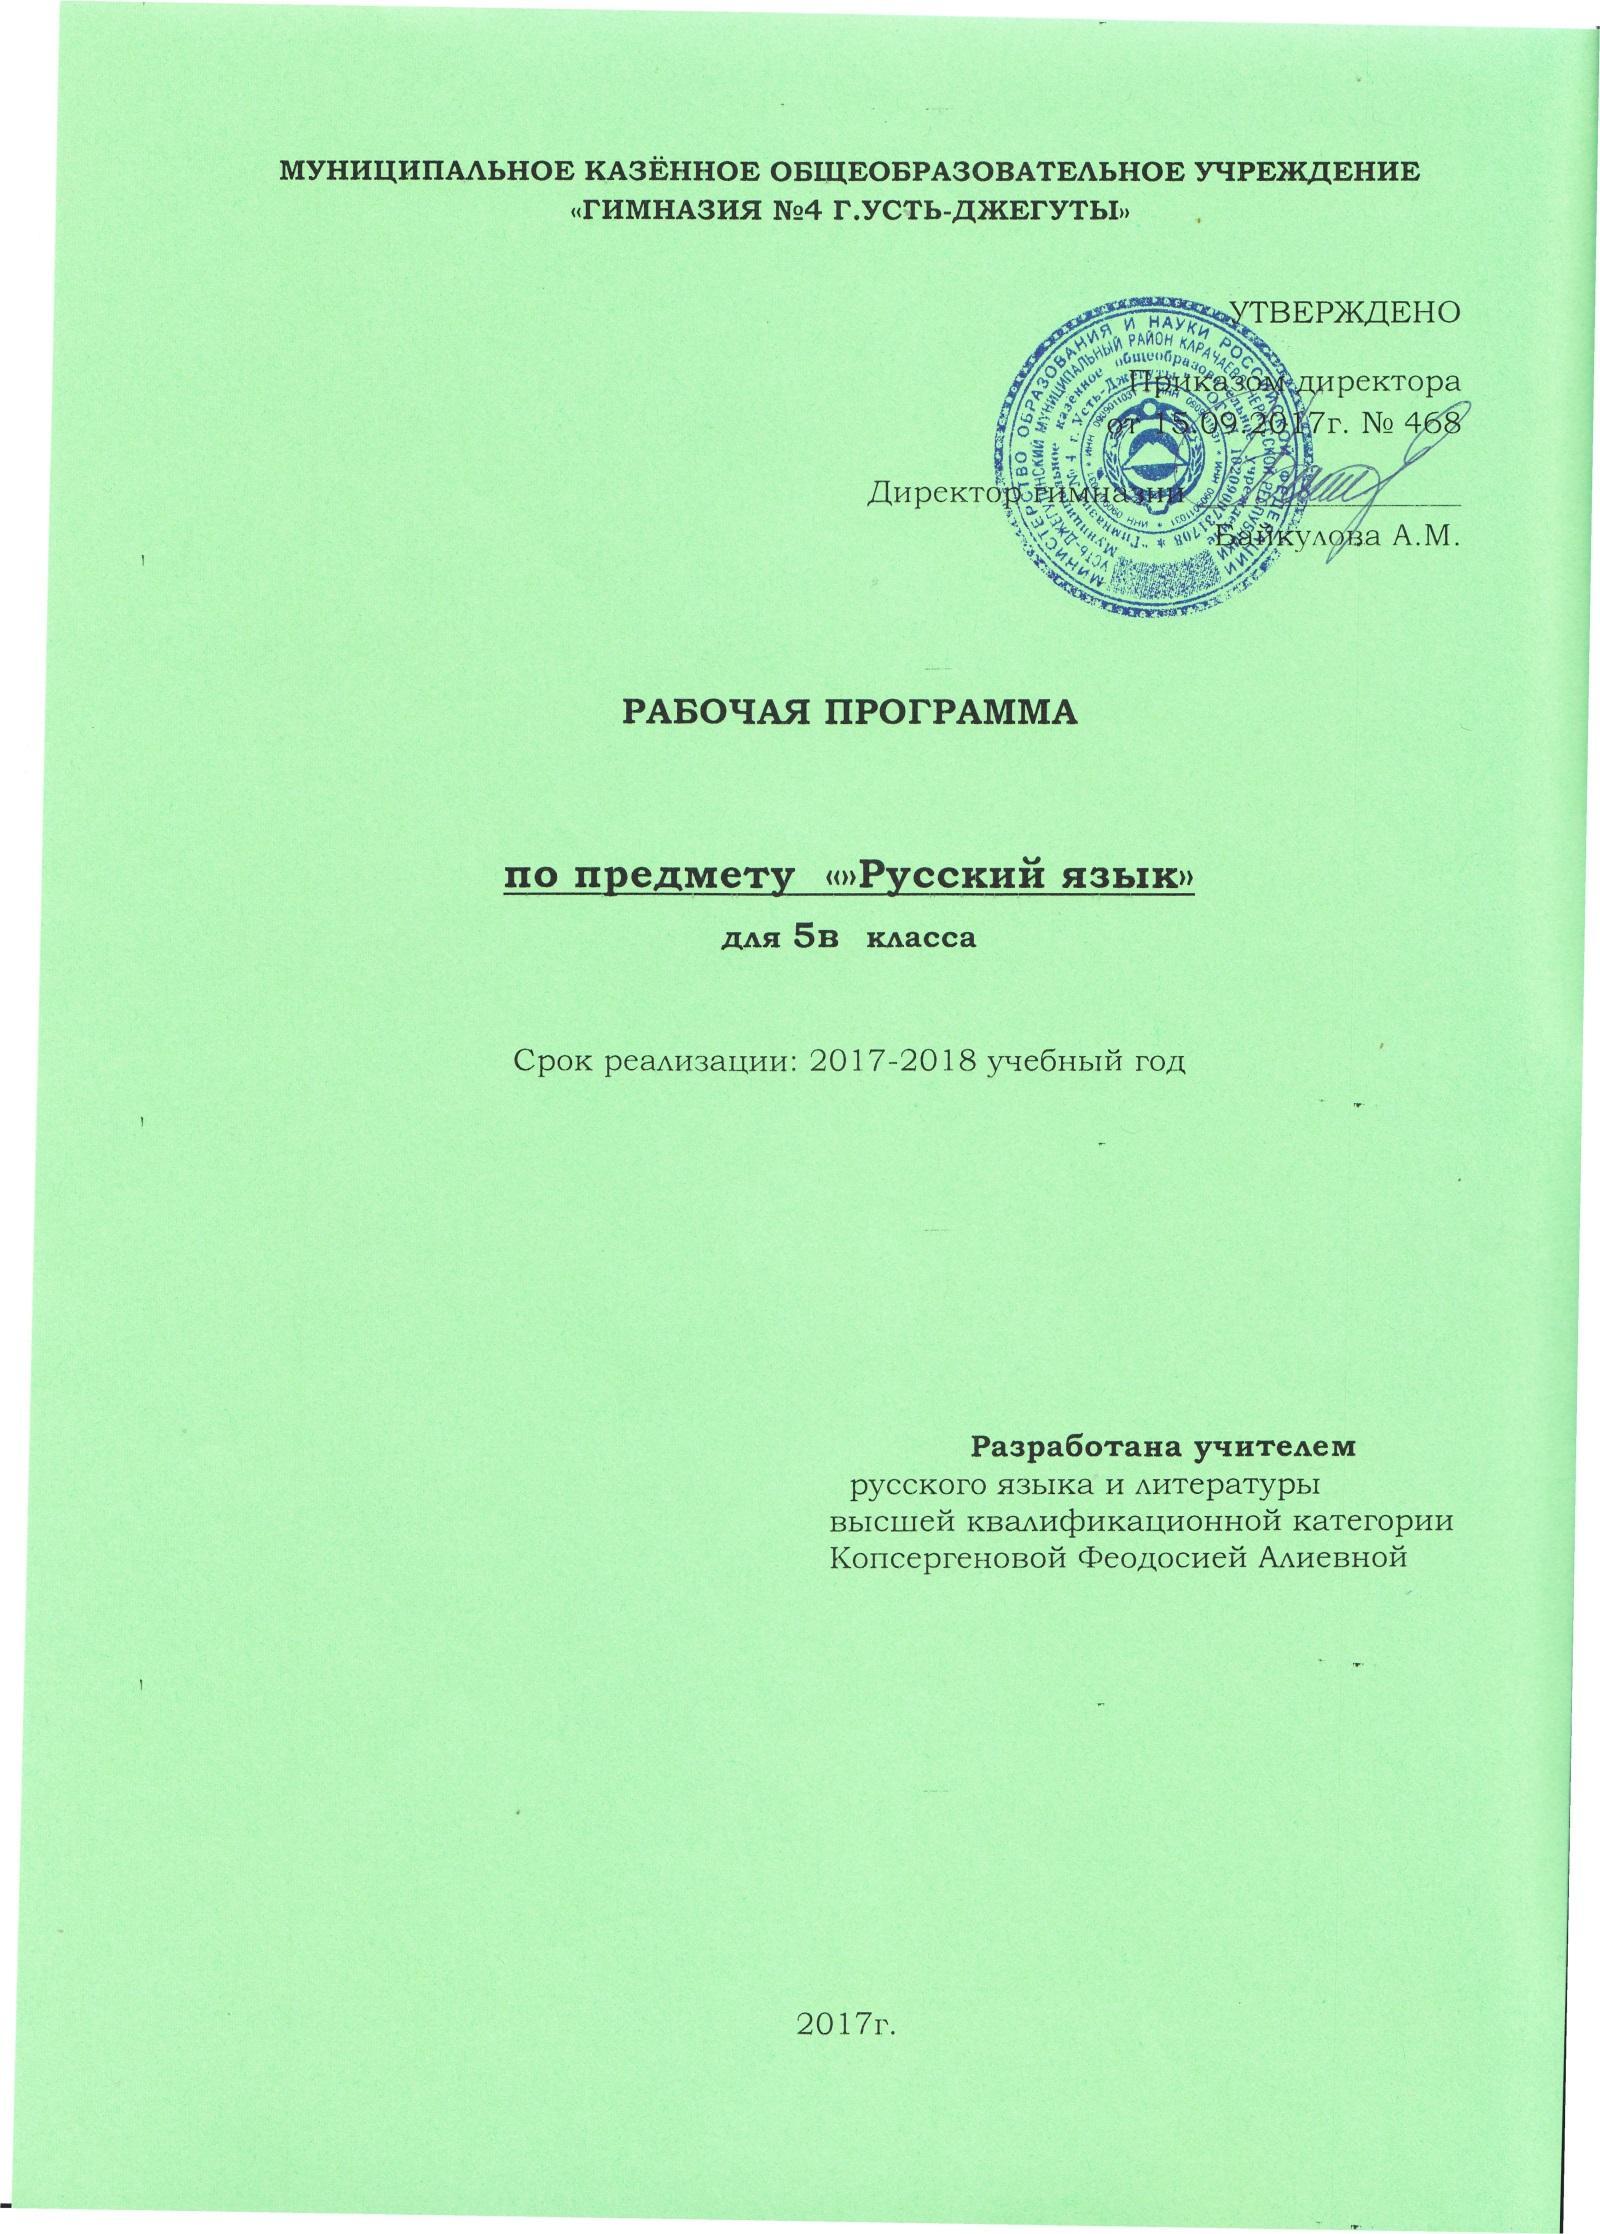 банк форштадт отзывы по кредитам